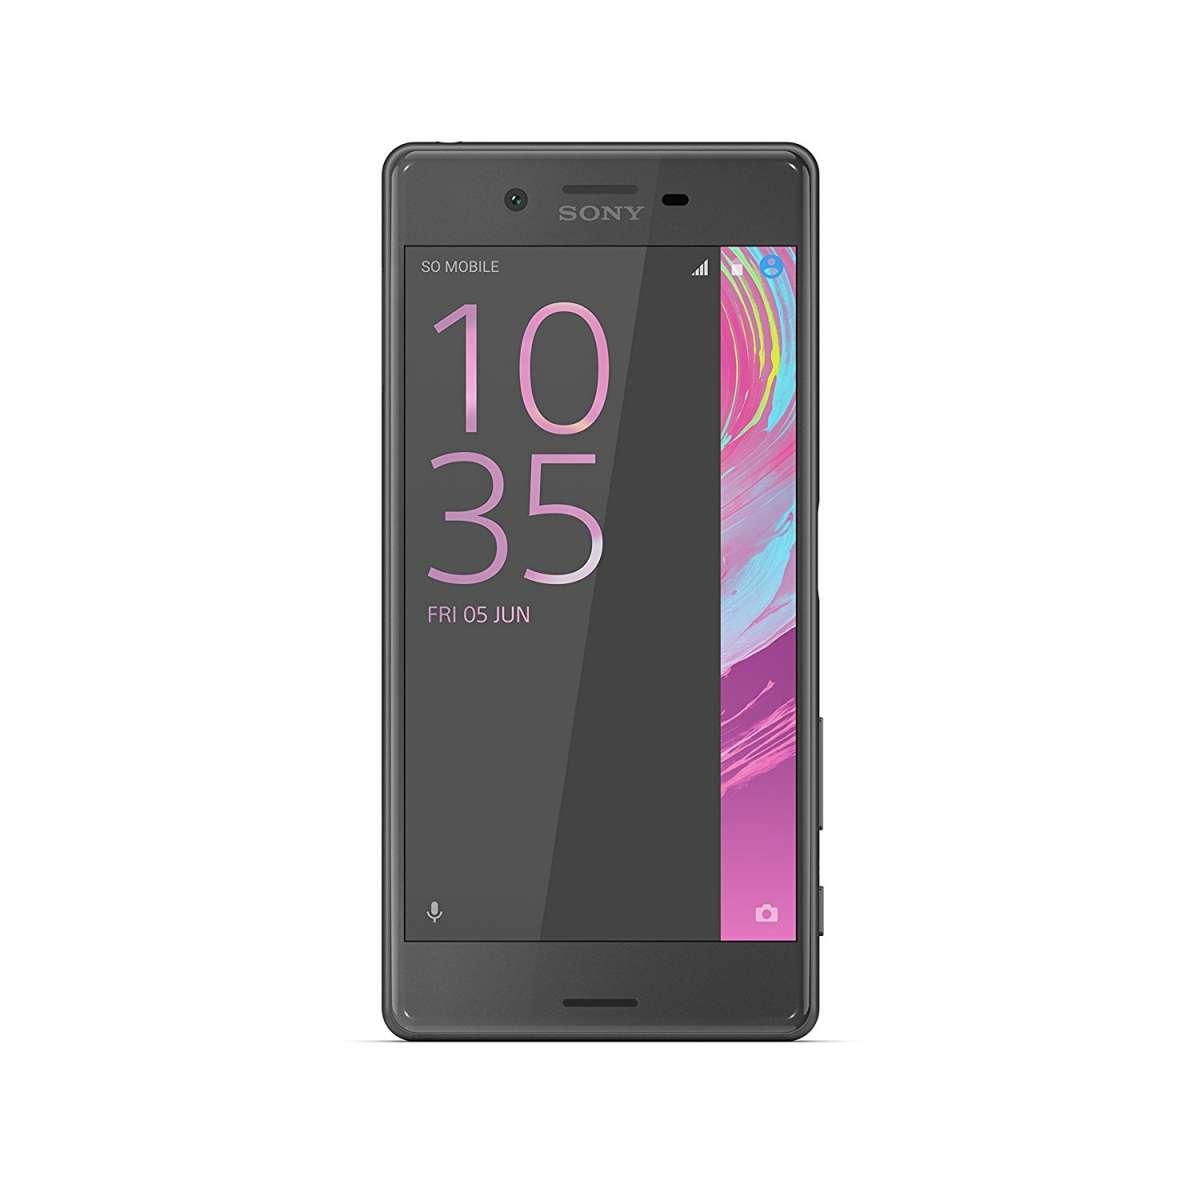 miglior smartphone android 5 pollici